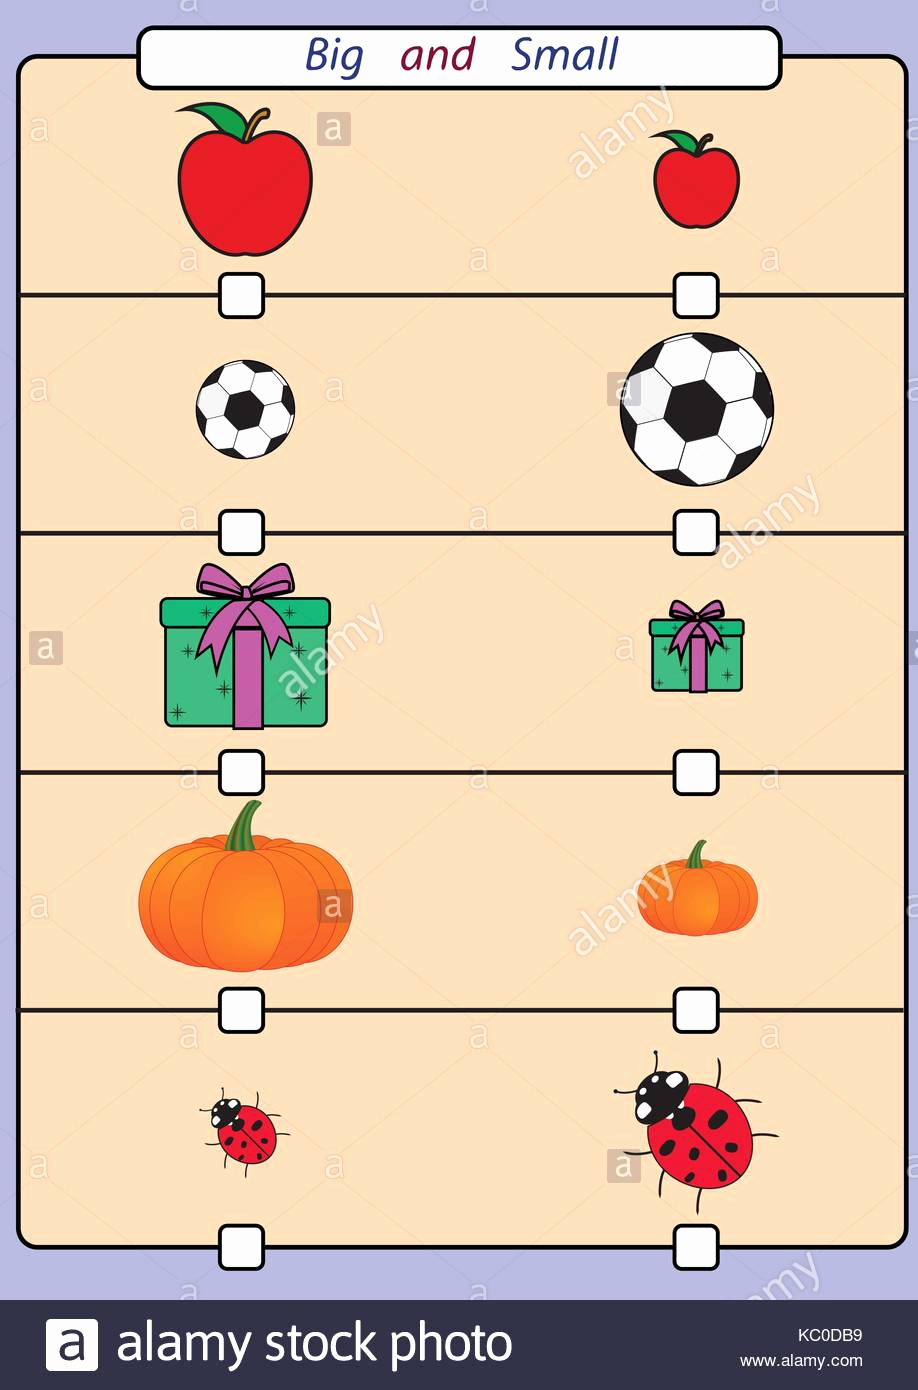 Big Vs Little Worksheets Awesome Find Big or Small Worksheet for Kids Stock Vector Art